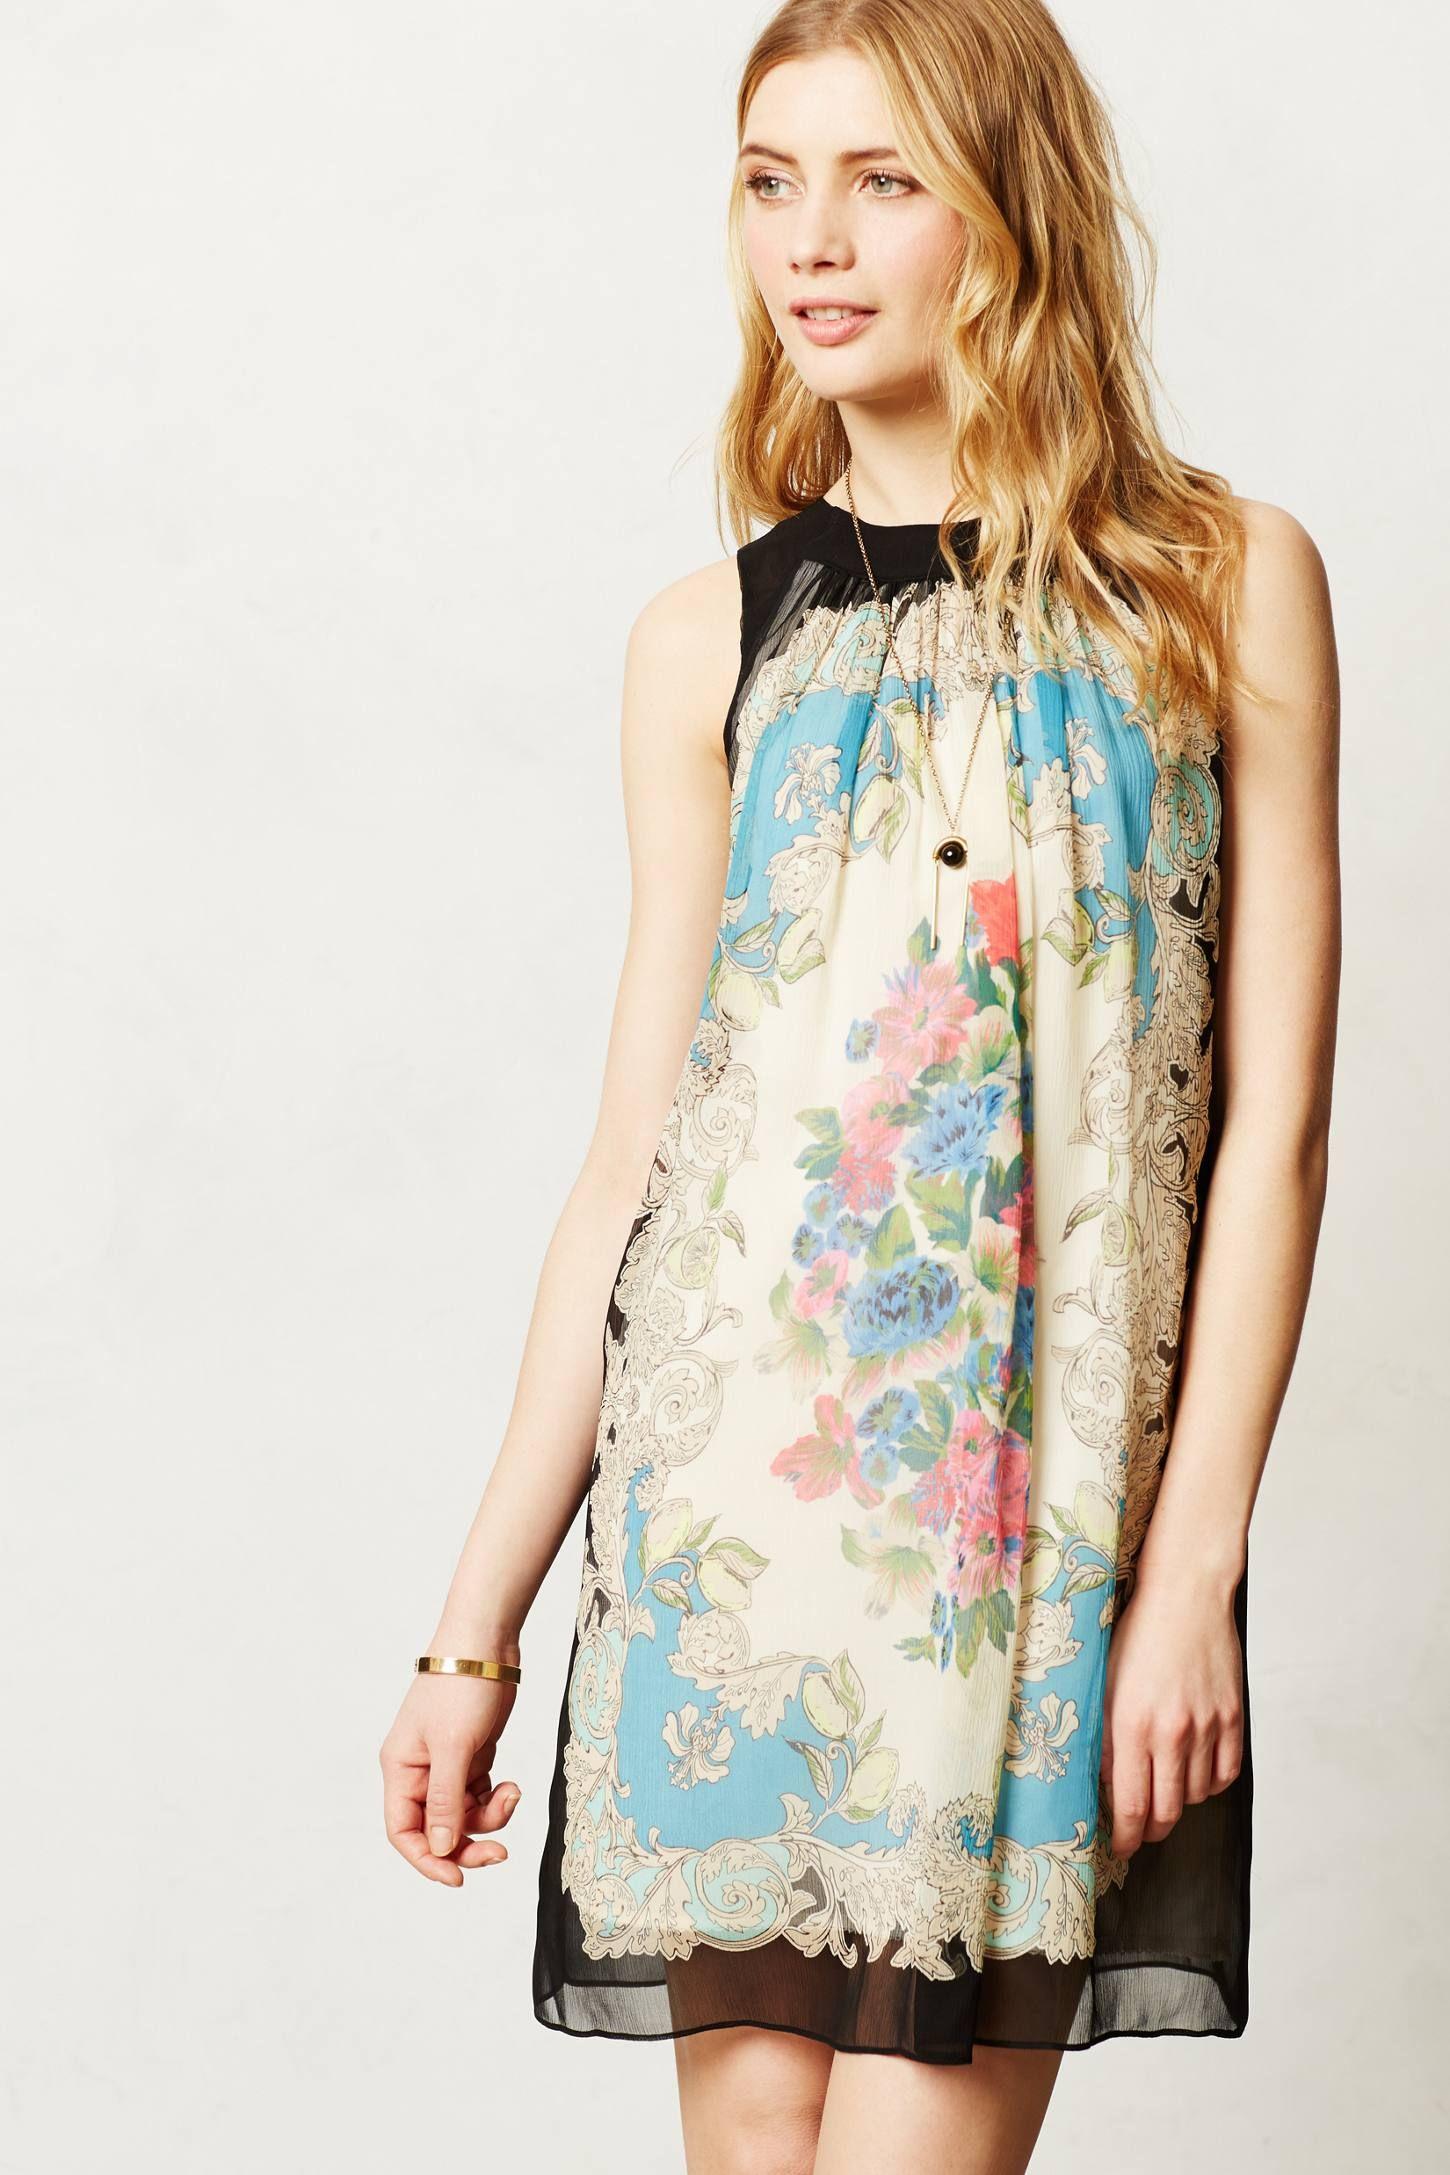 Flora Vignette Dress - anthropologie.com (Front) SO CUTE